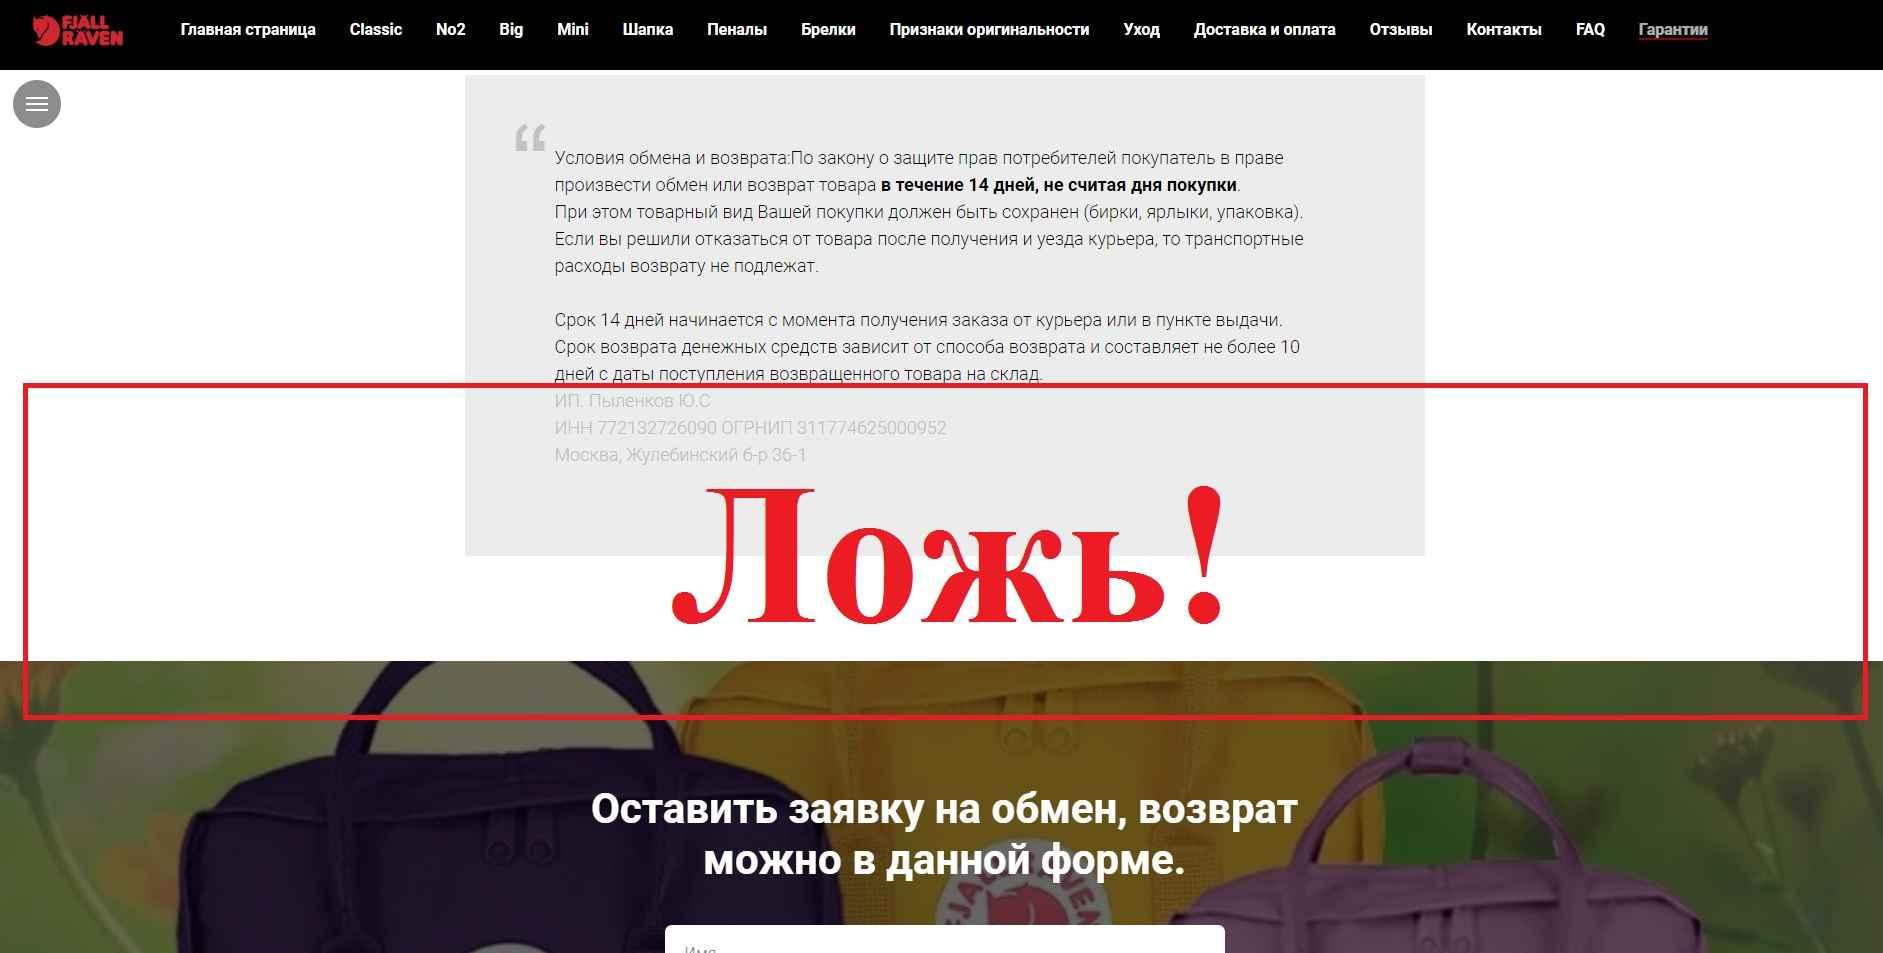 Fjallraven kanken – реальные отзывы о fjallravenbag.ru